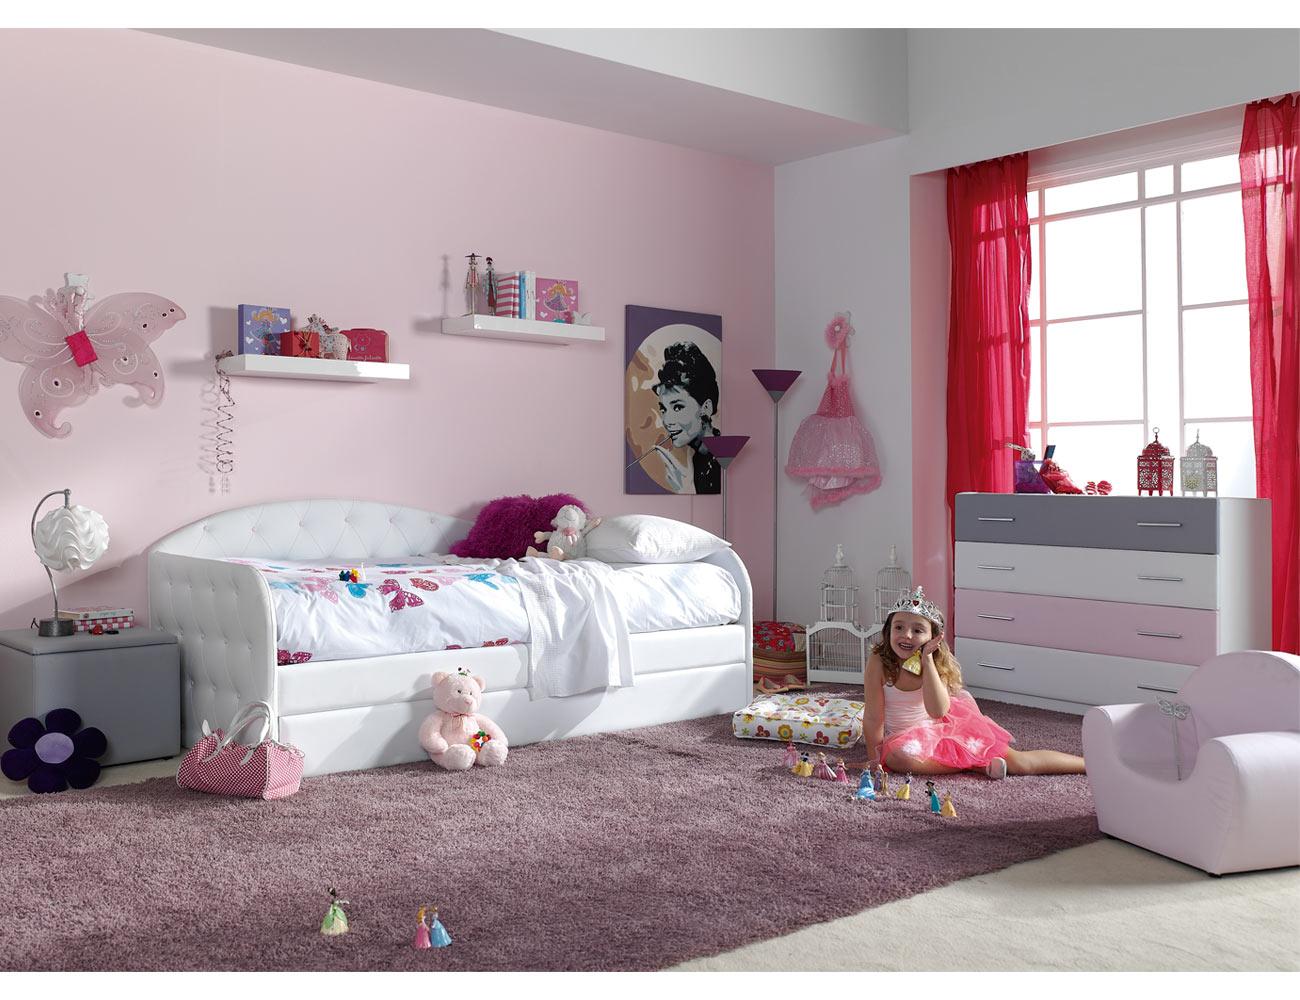 243 cama nido10